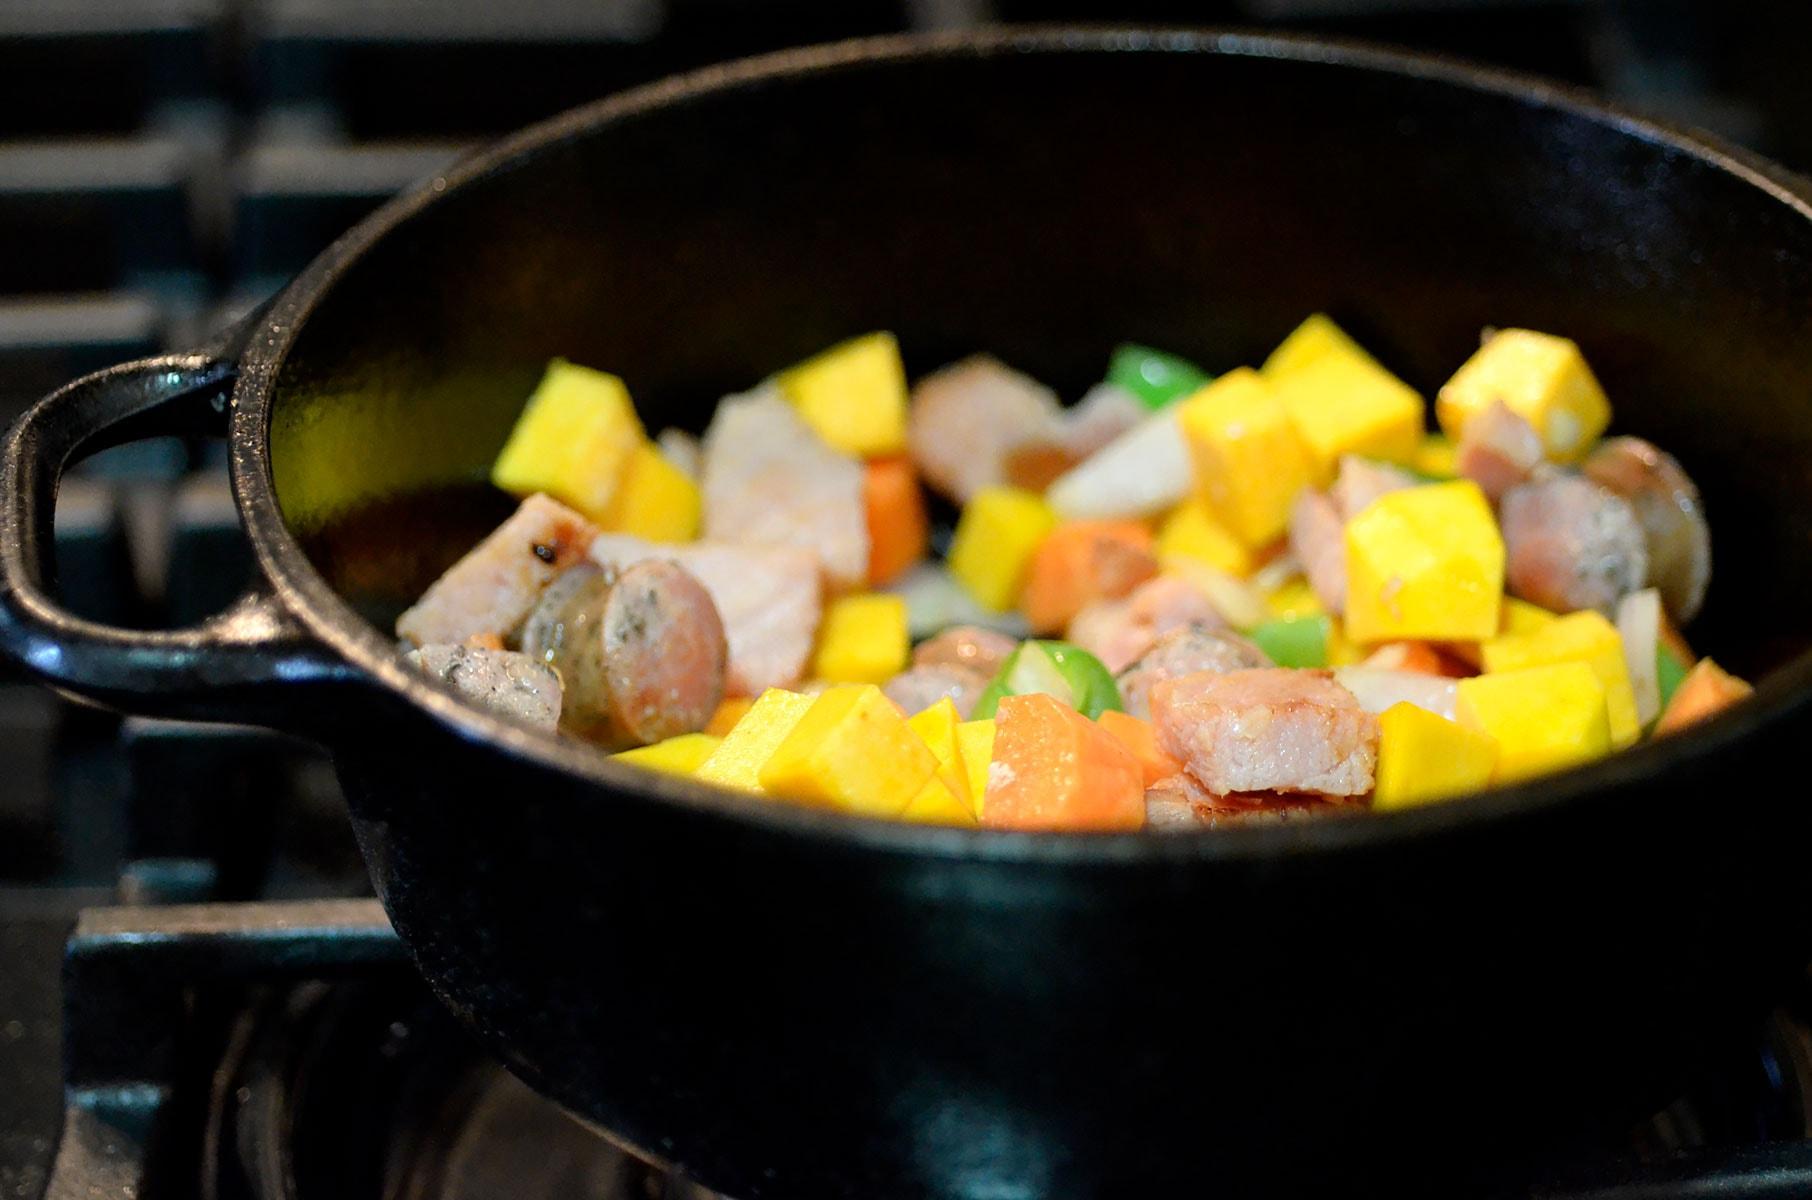 Vegetales y carnes en caldero